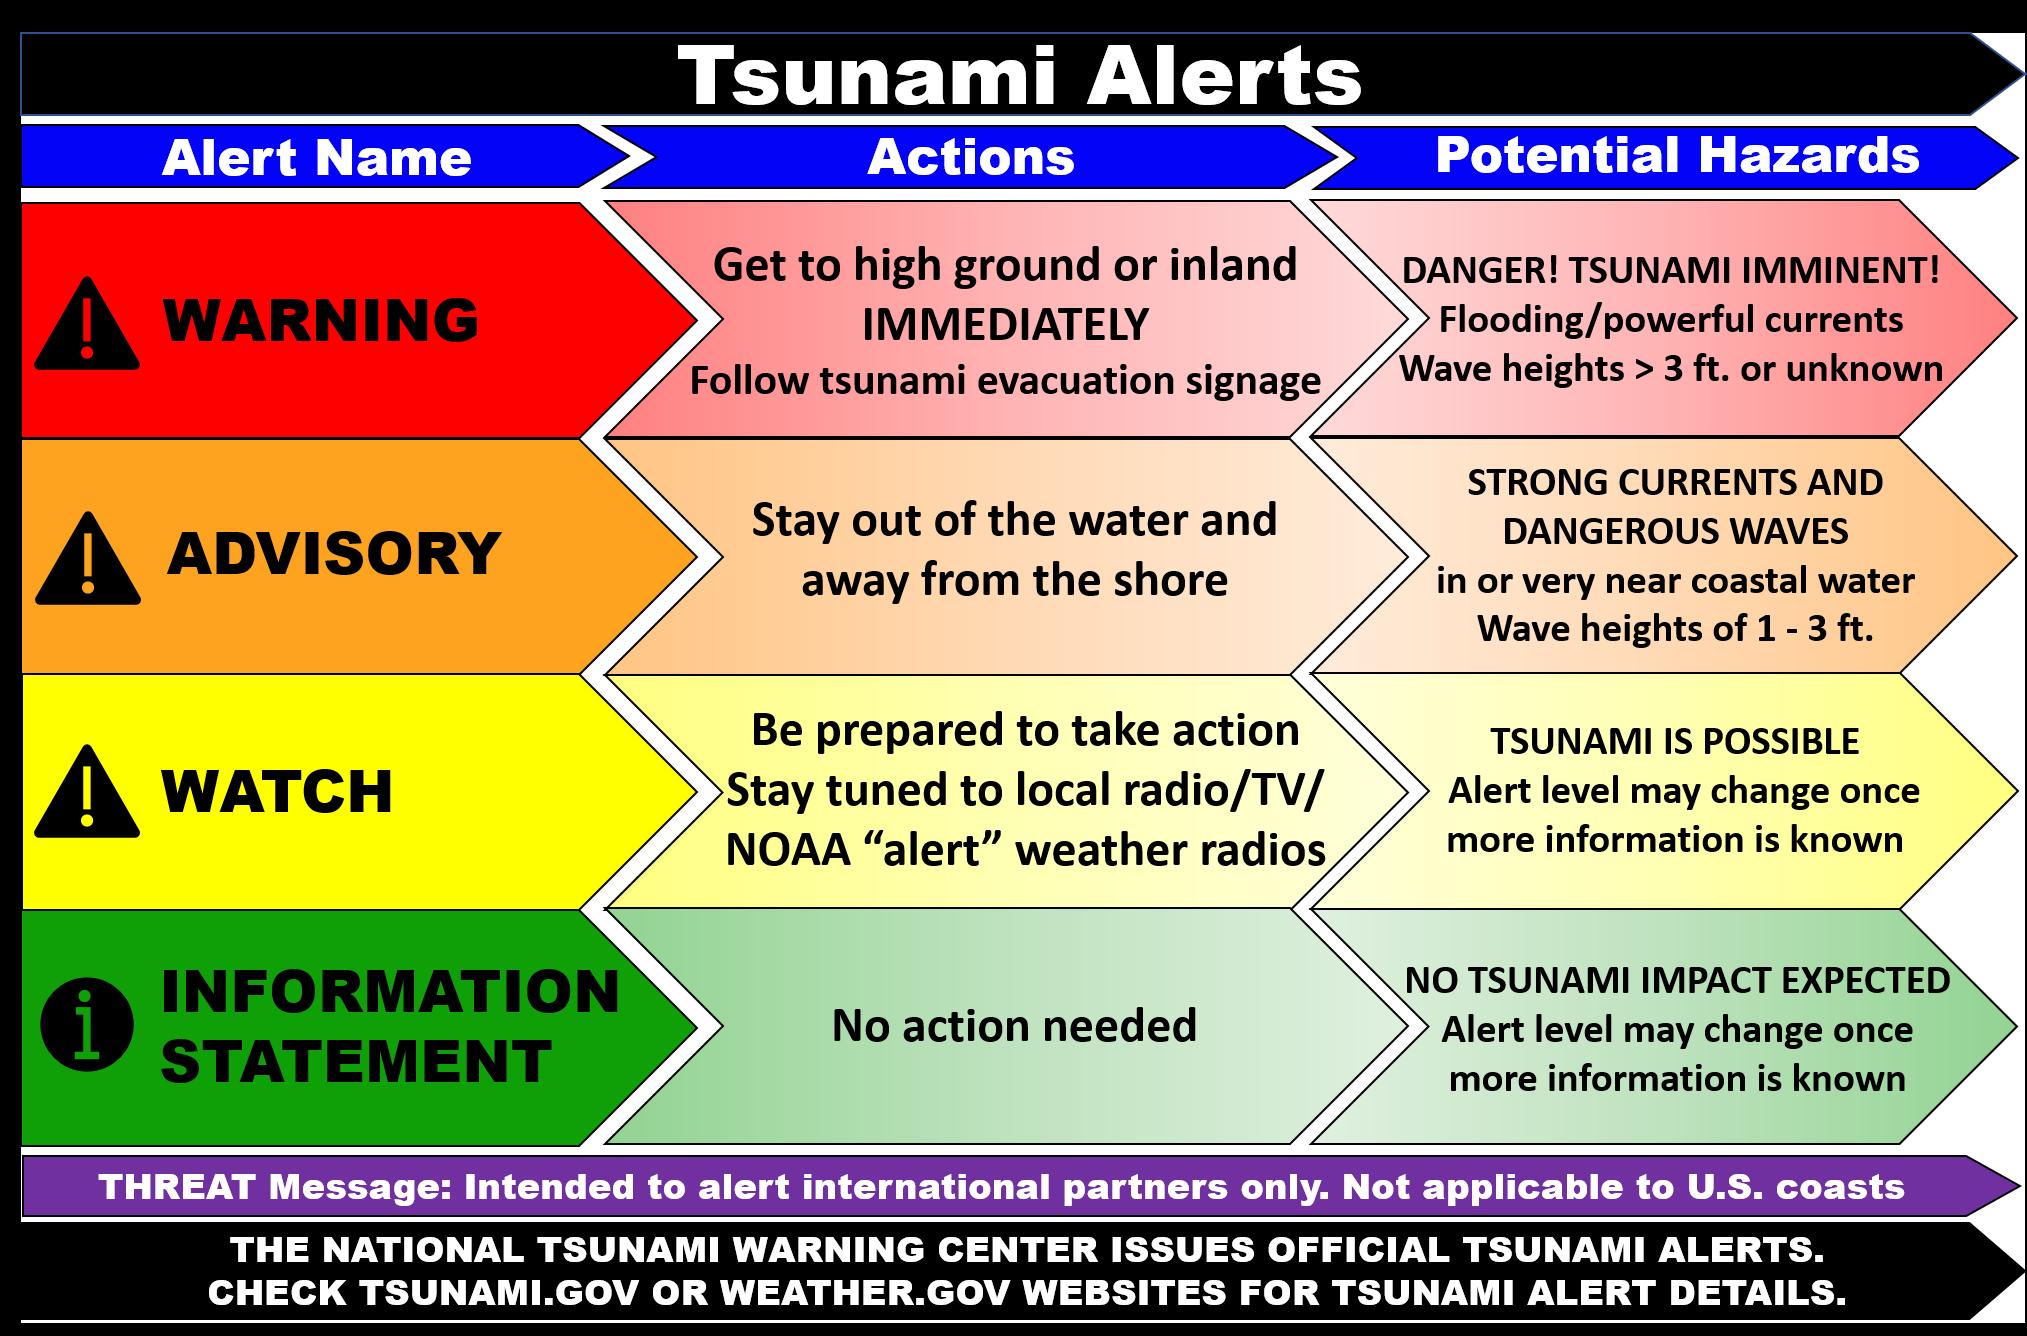 180321_tsunami-alert-infographic.png